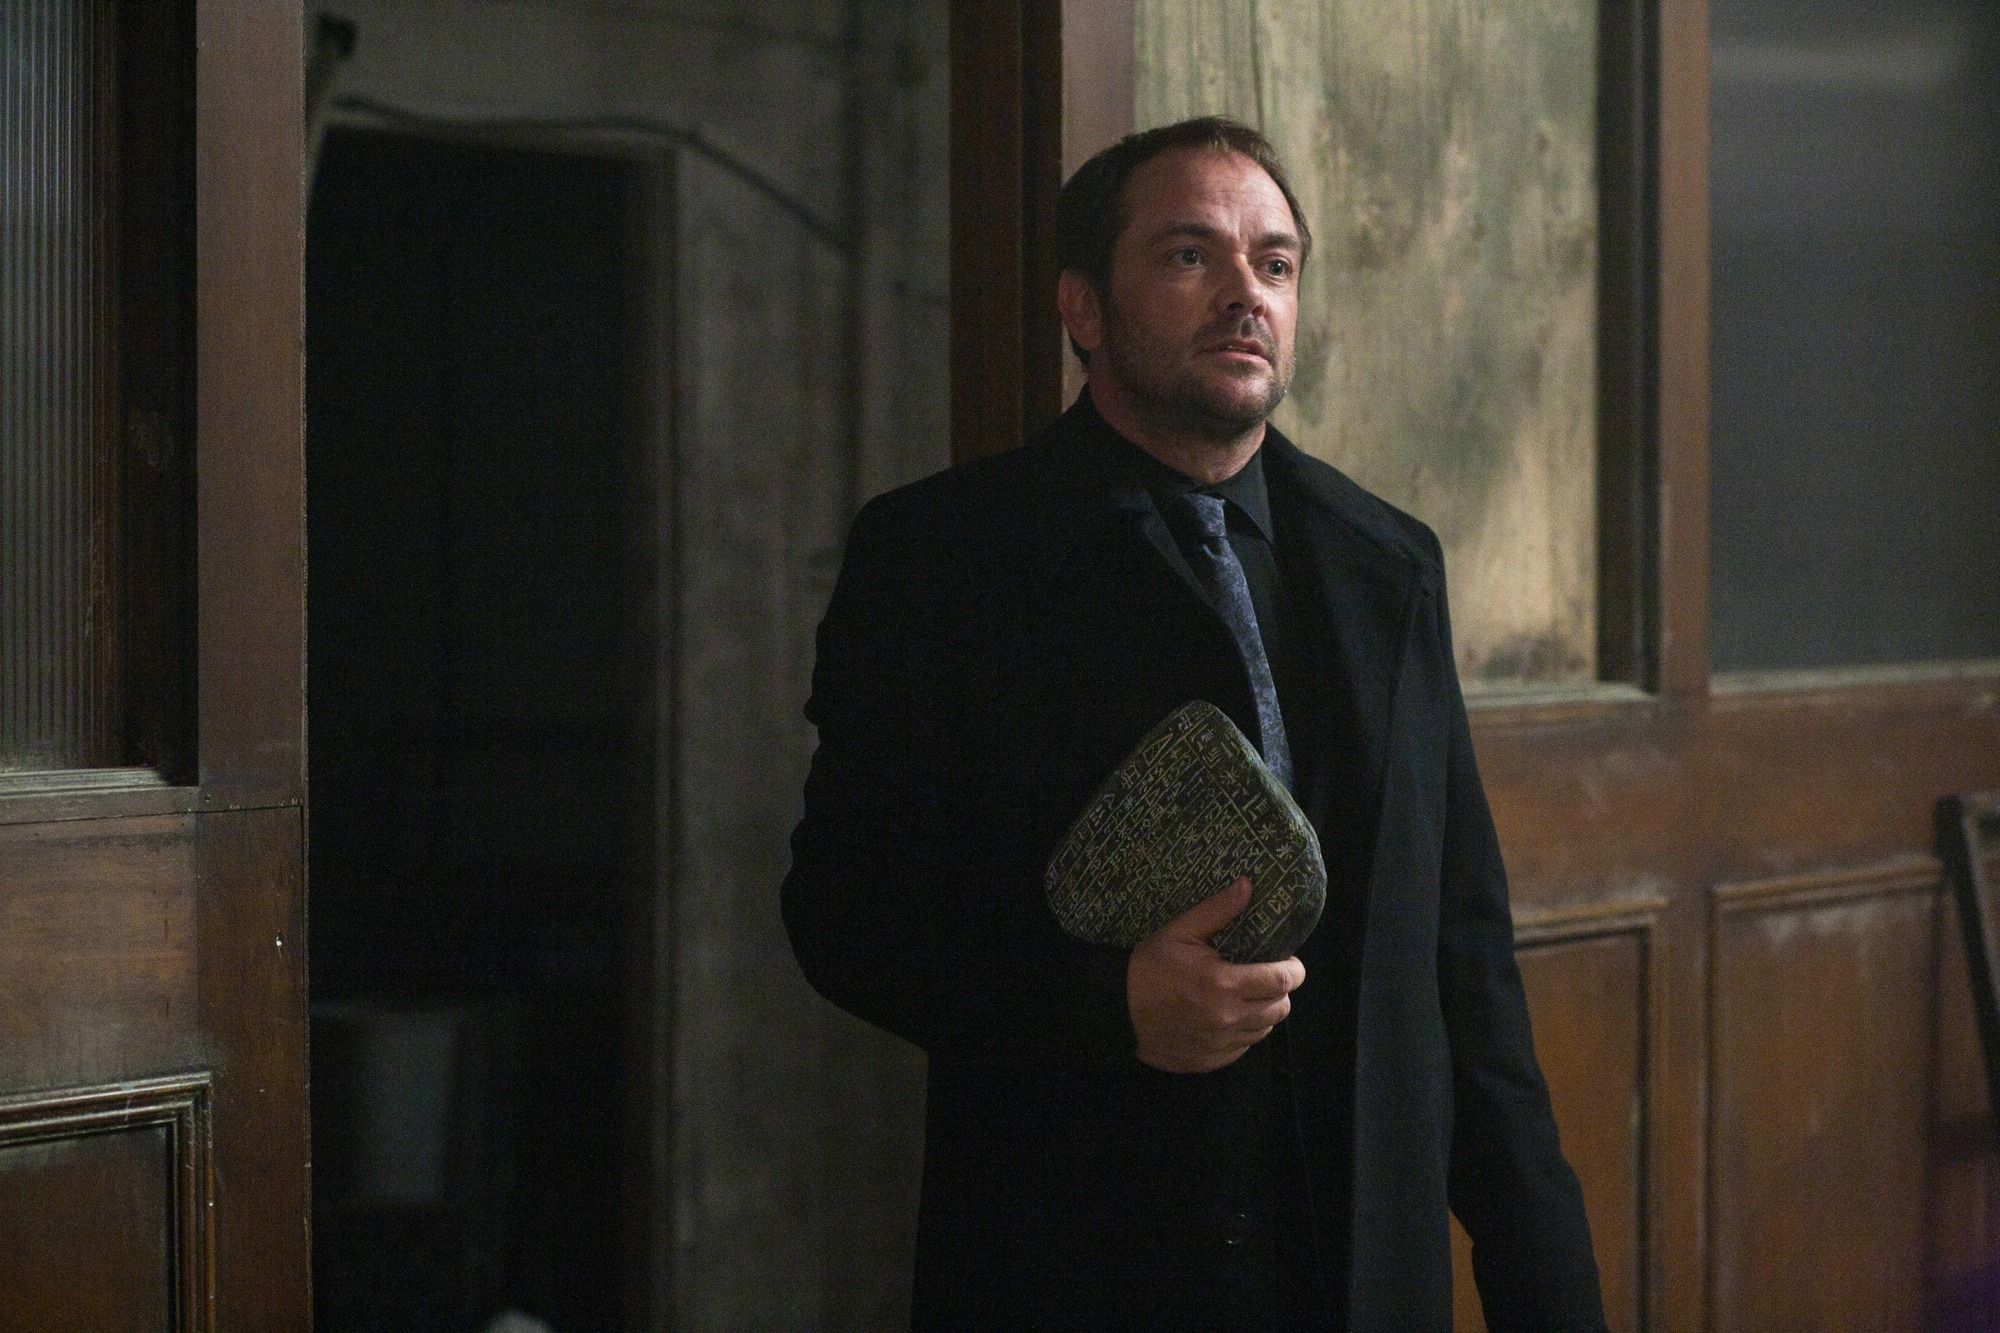 Pin by Aleksandra Ackles Jocić on Supernatural Season 8